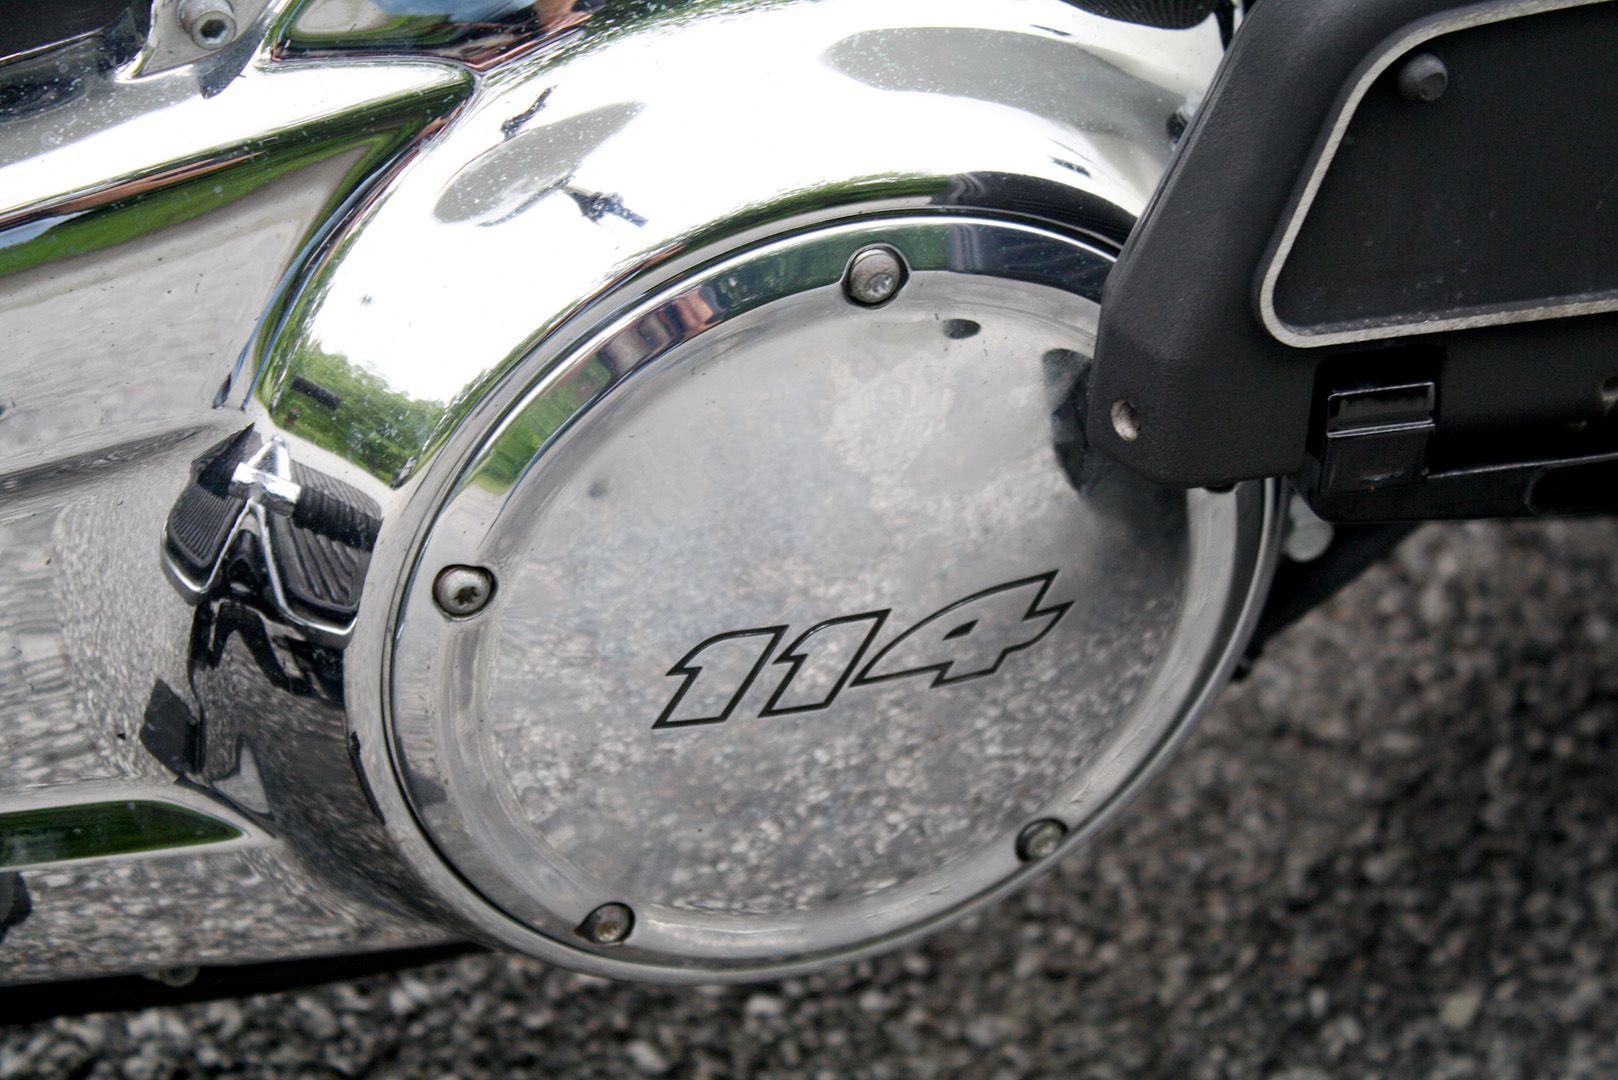 Pre-Owned 2019 Harley-Davidson Freewheeler